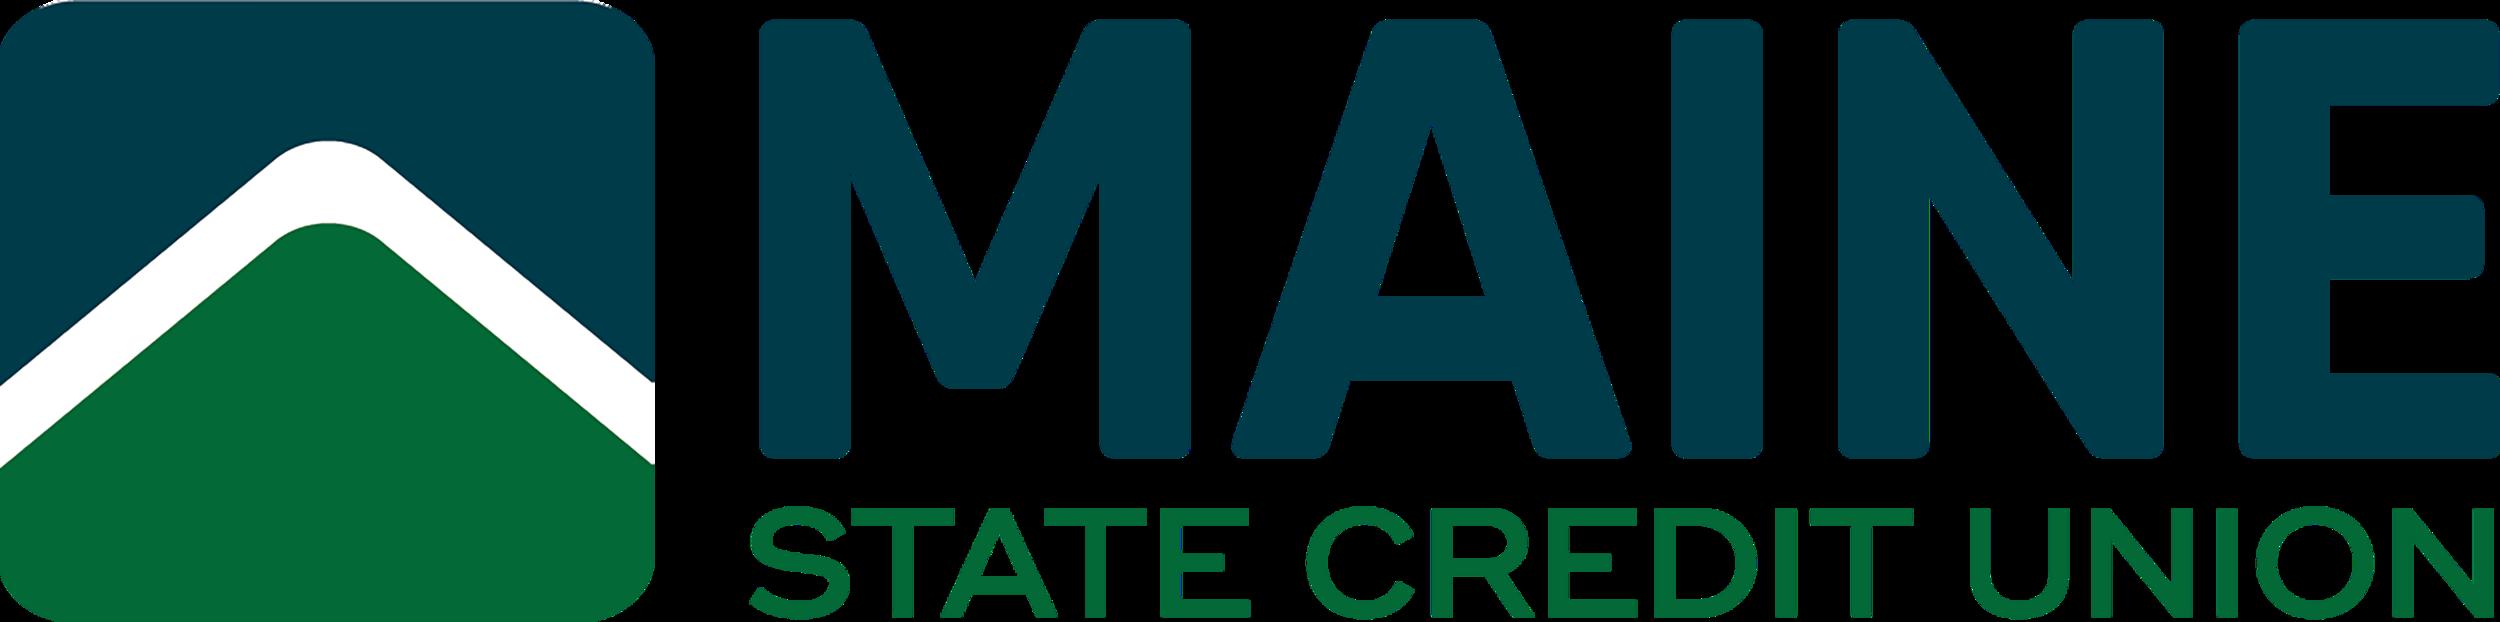 MSCU Logo.png